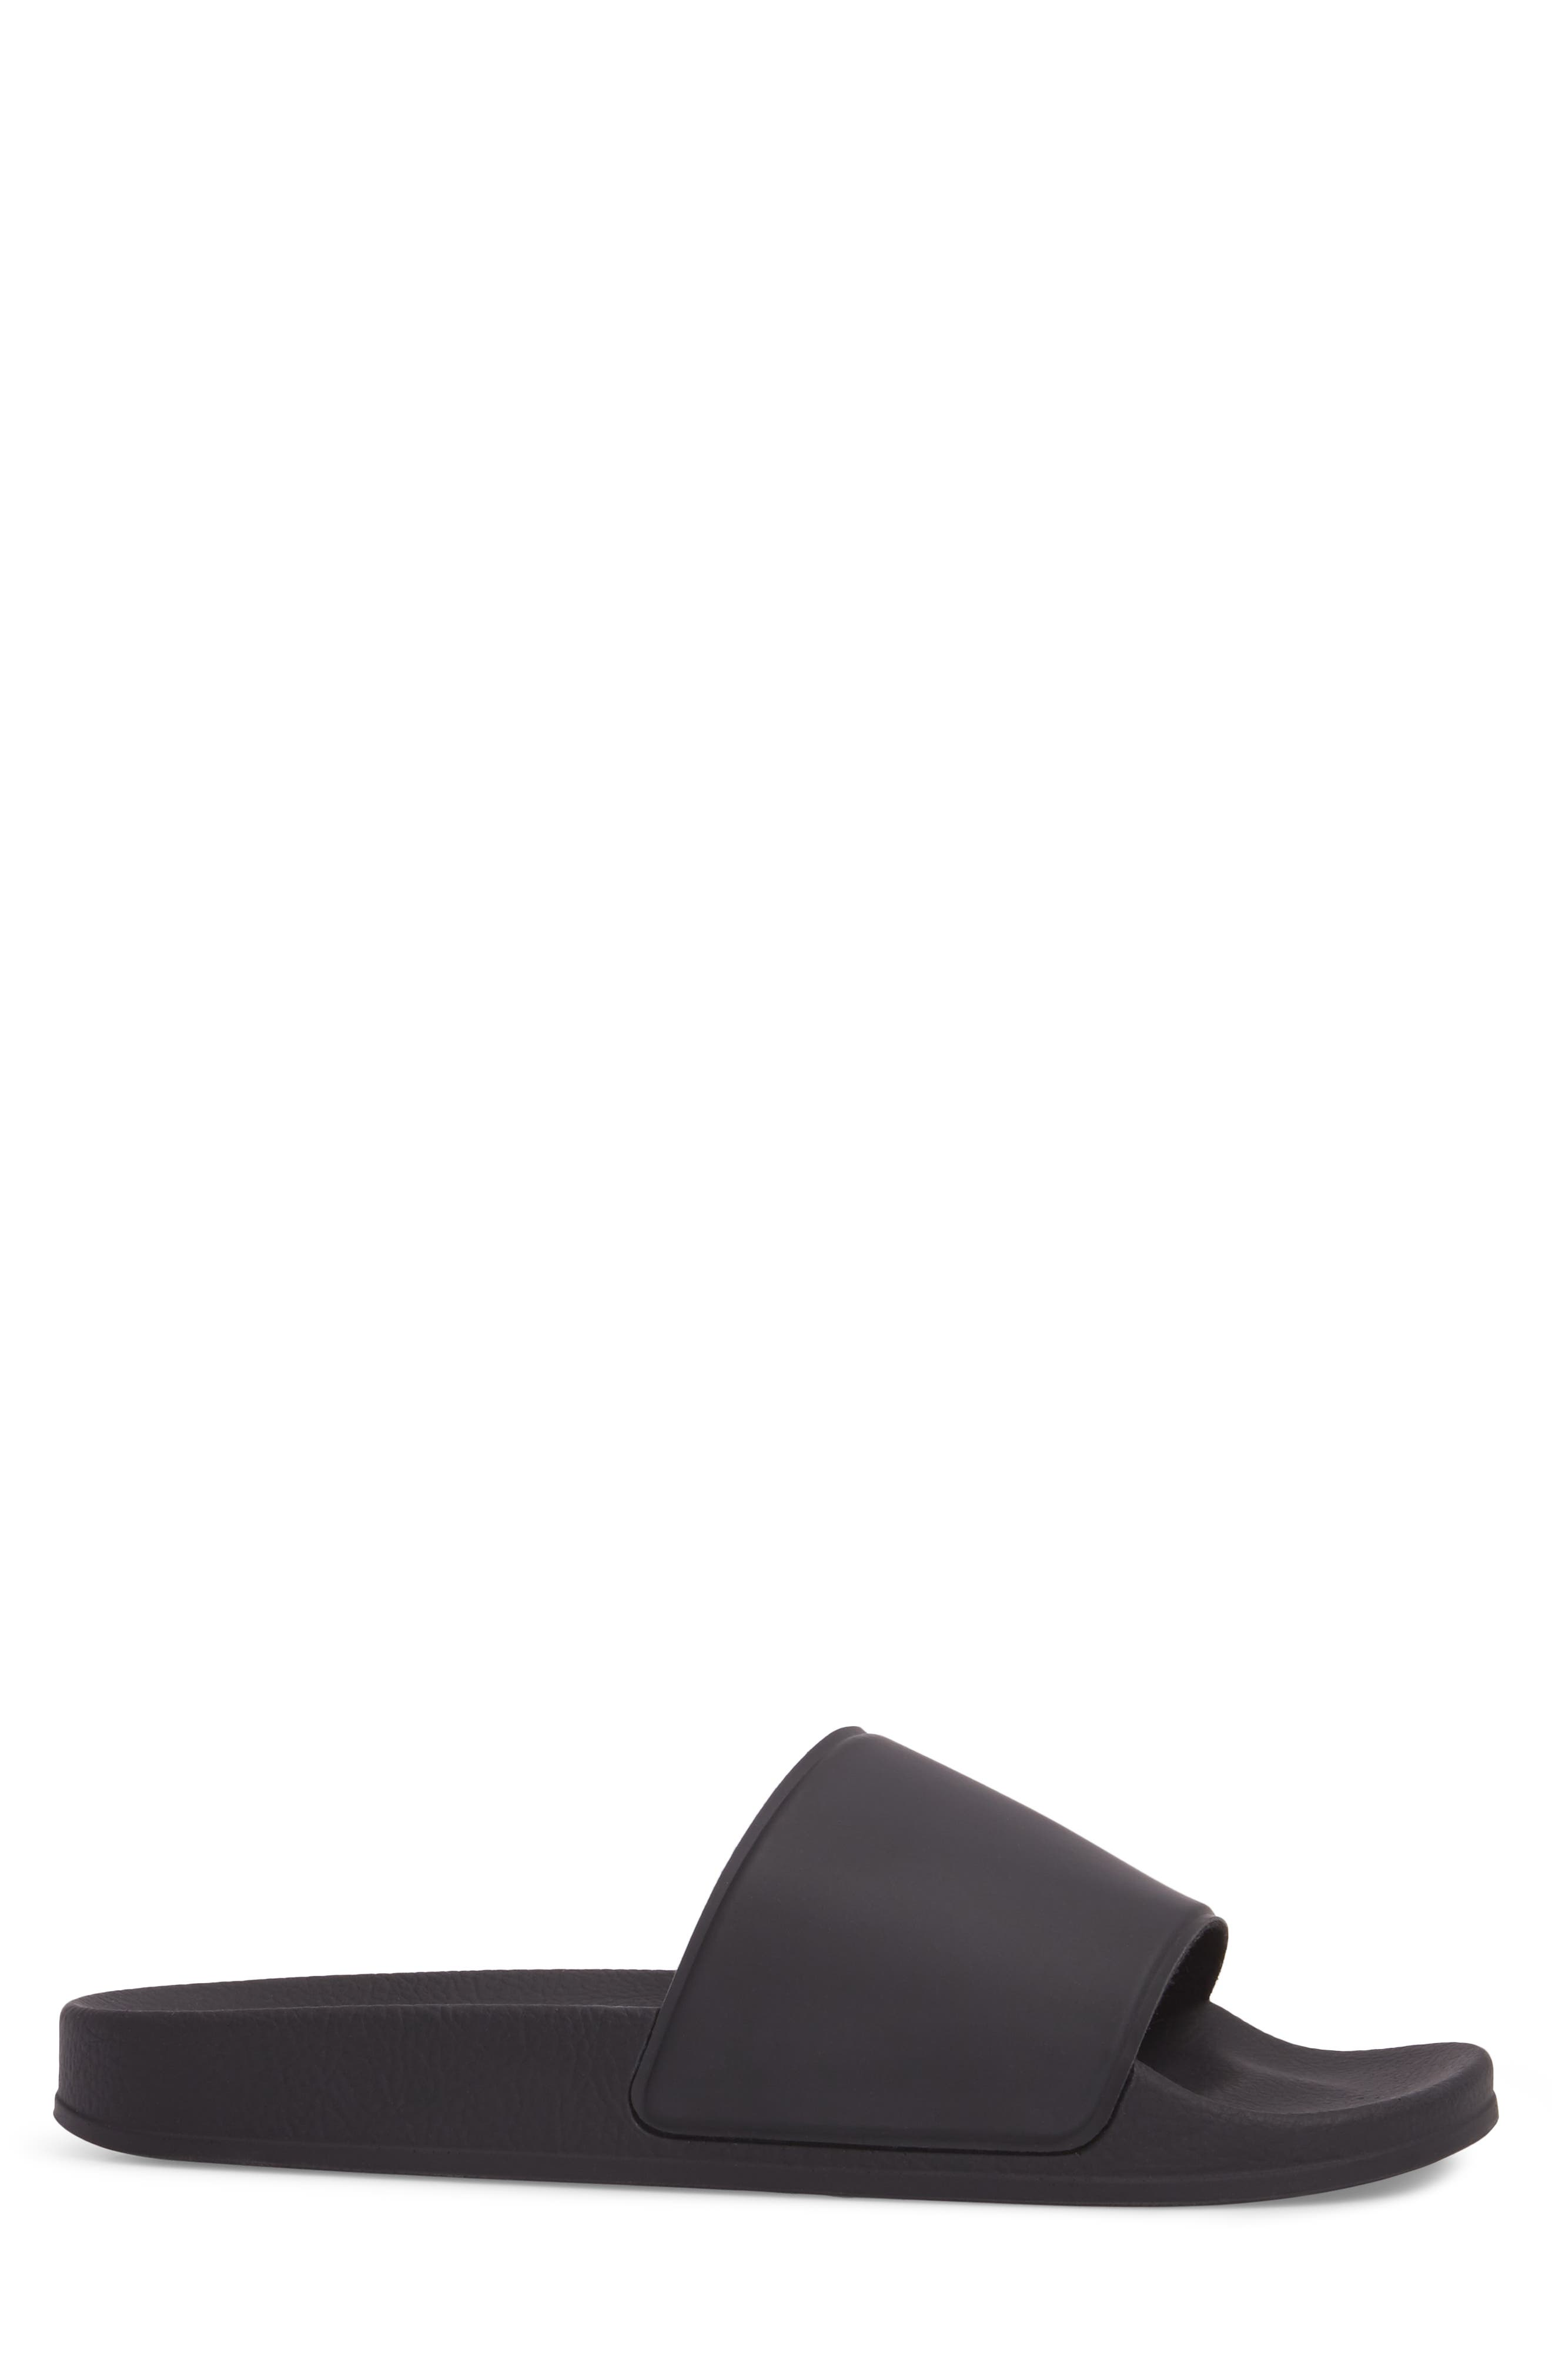 Bondi Slide Sandal,                             Alternate thumbnail 3, color,                             BLACK